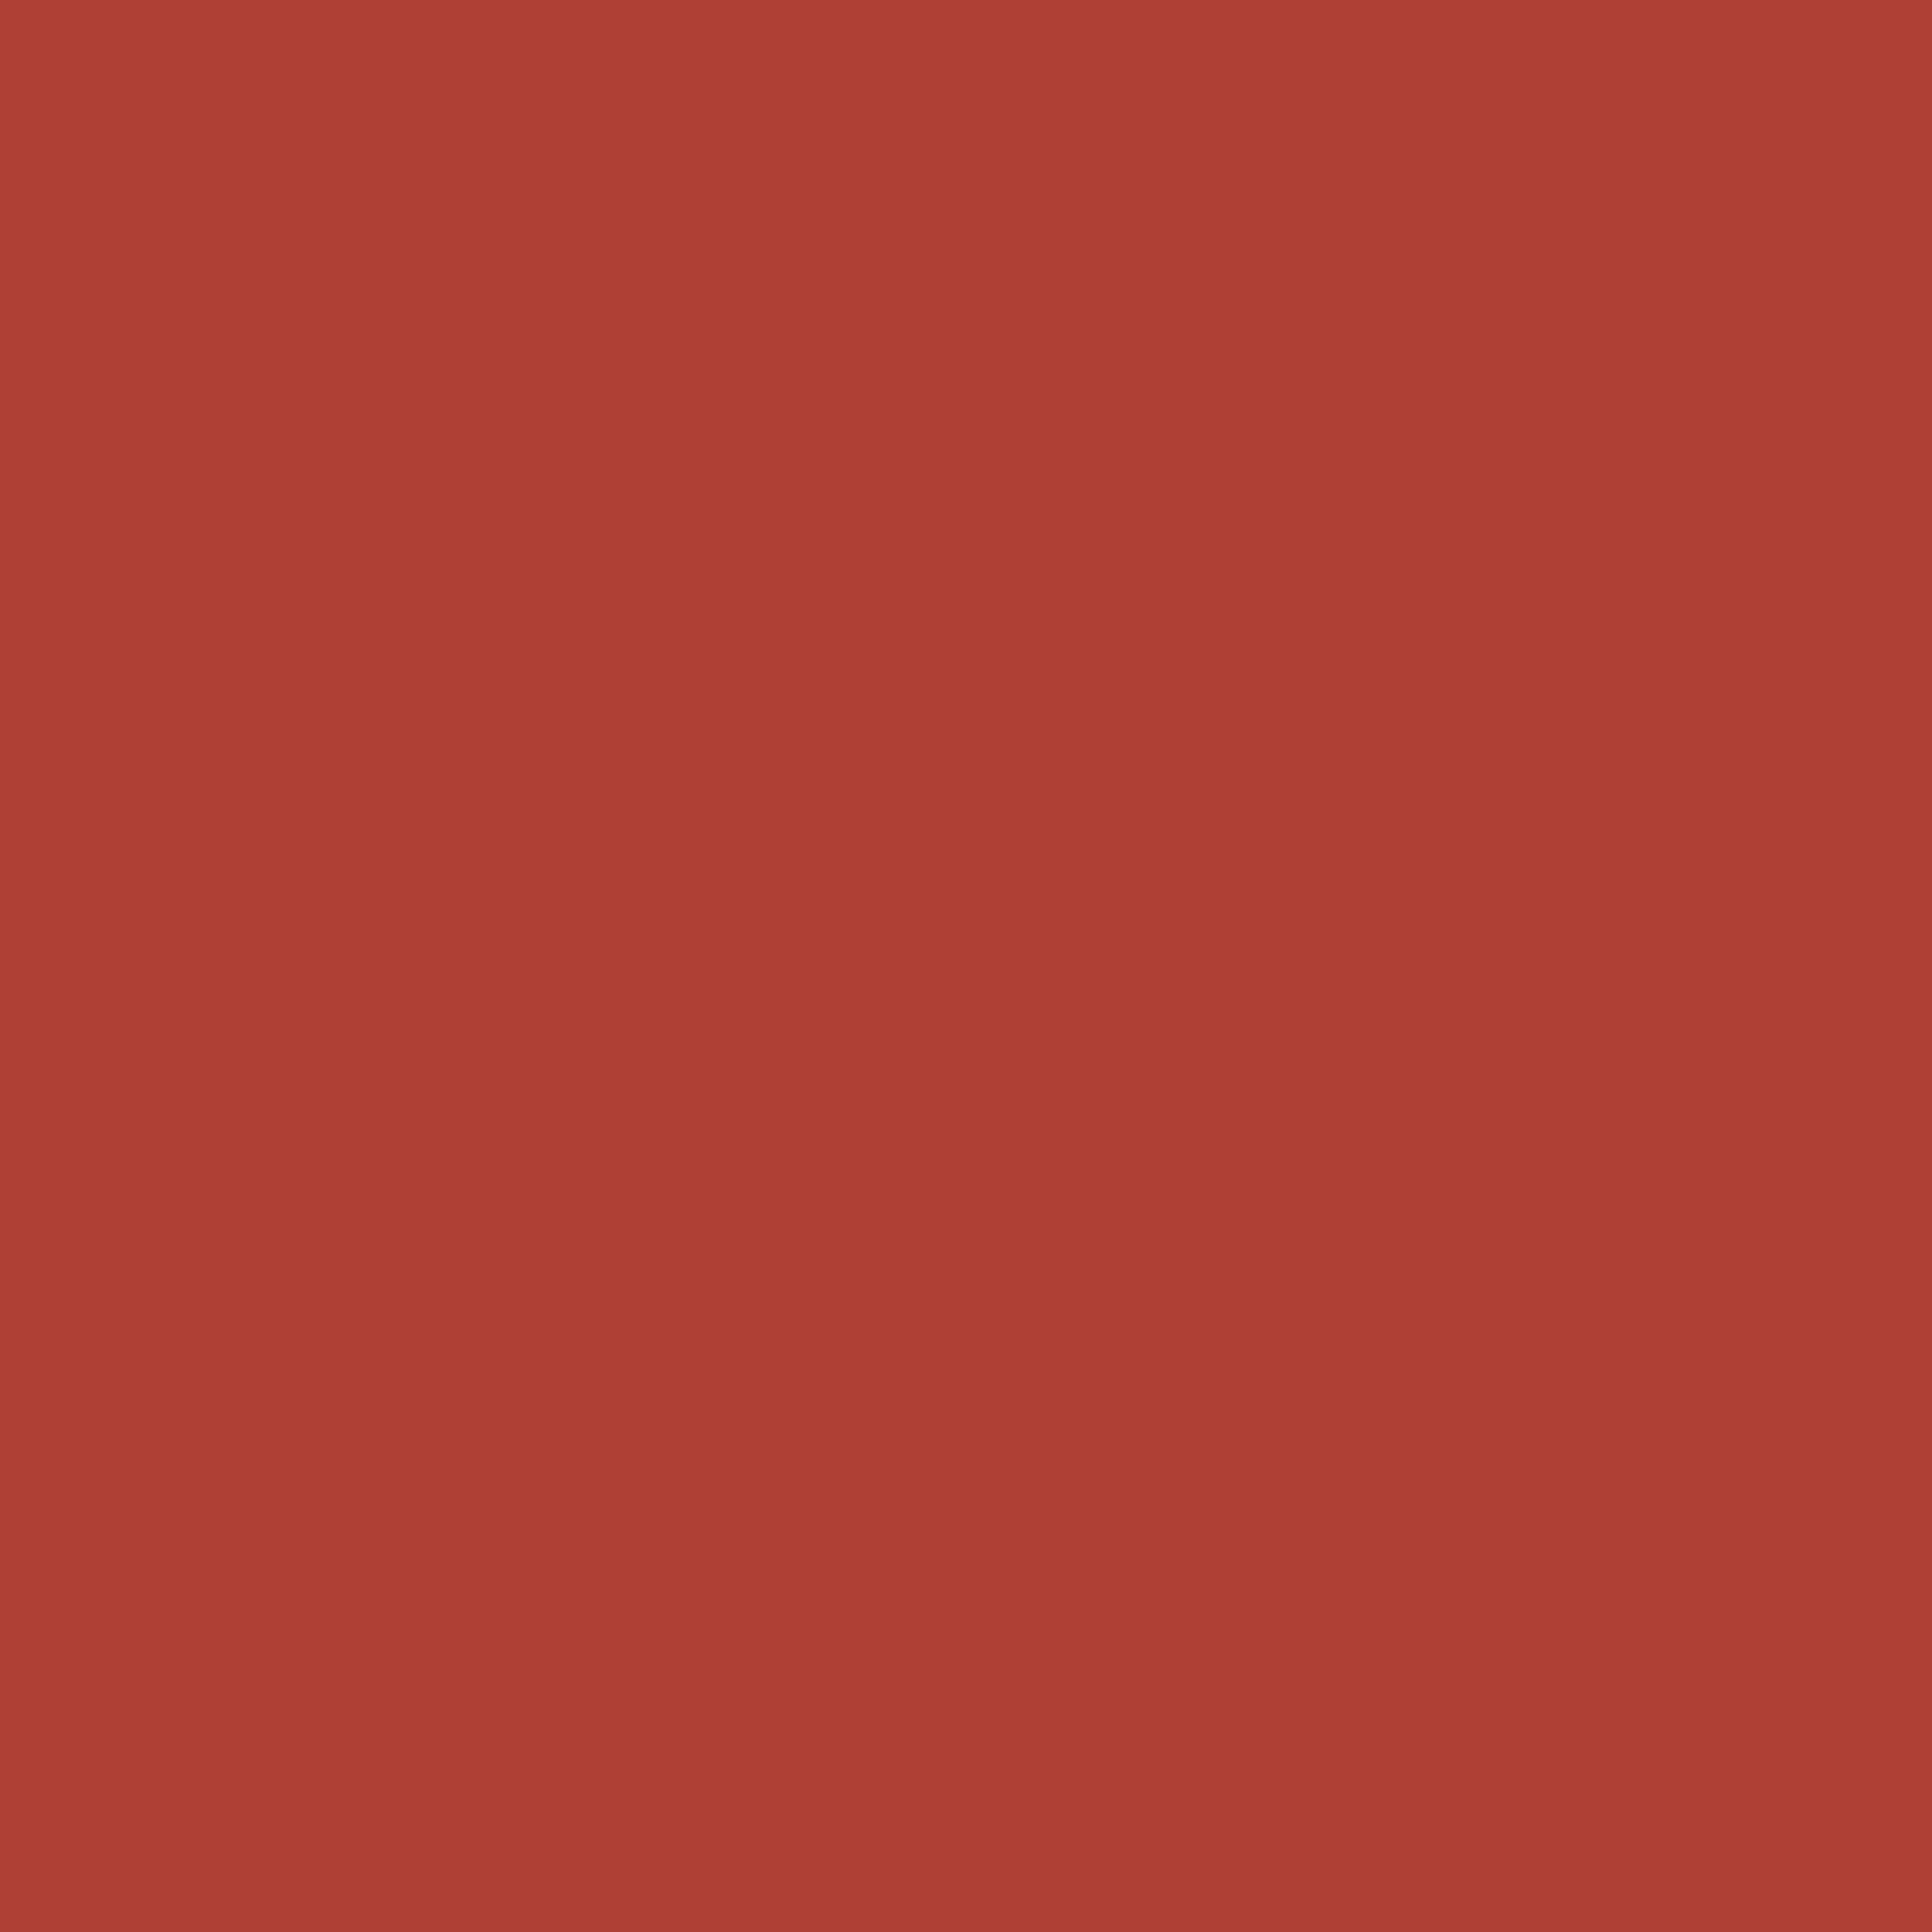 3600x3600 Pale Carmine Solid Color Background